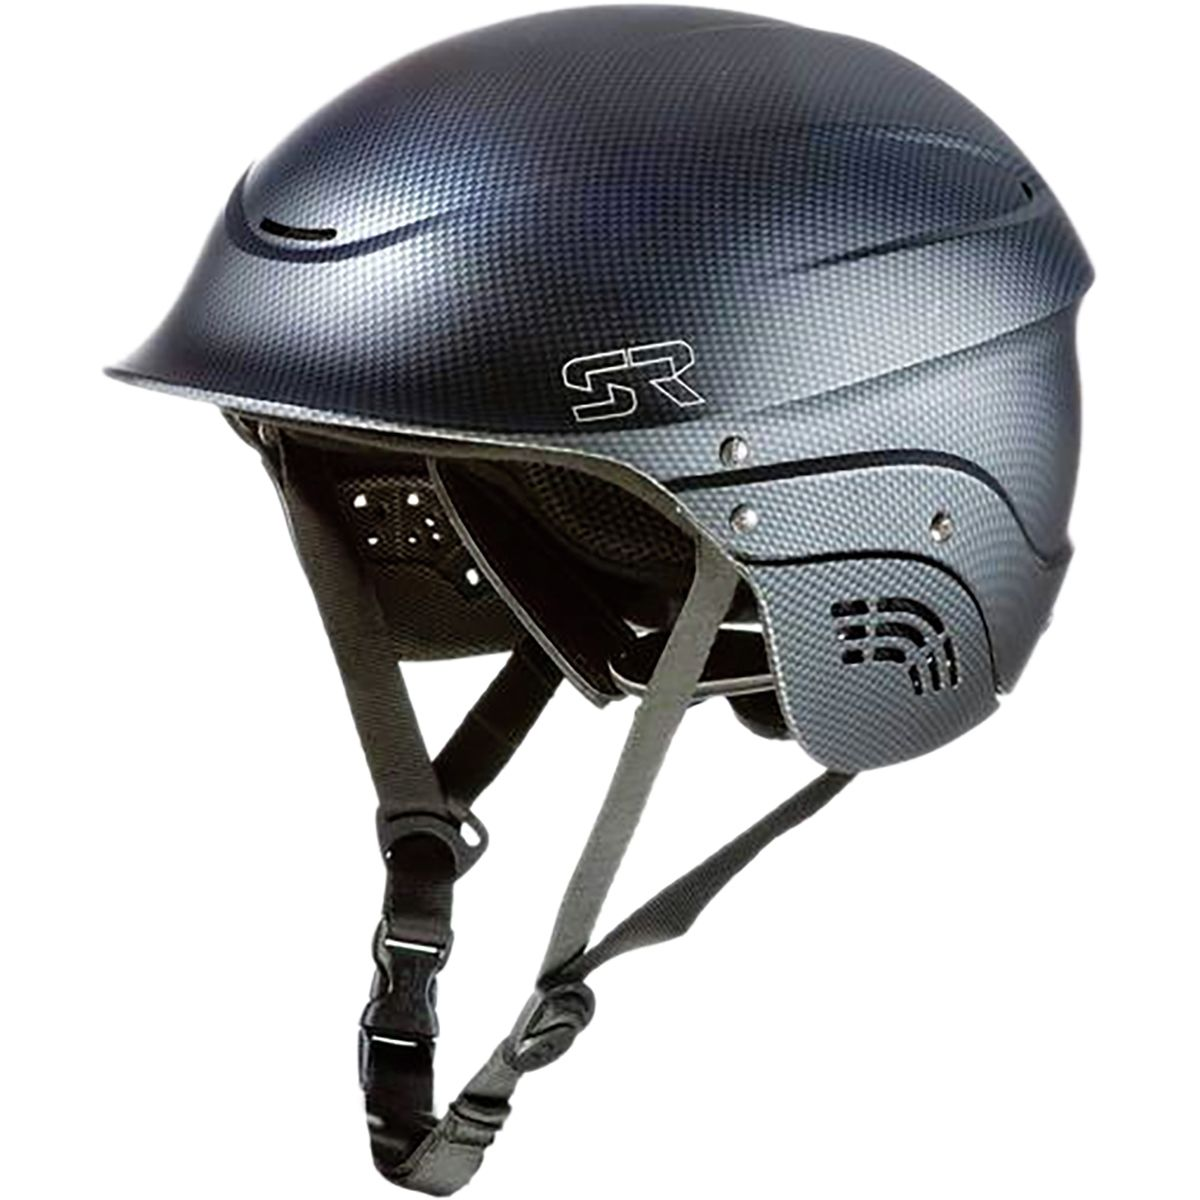 Shred Ready Standard – Full Cut Helmet